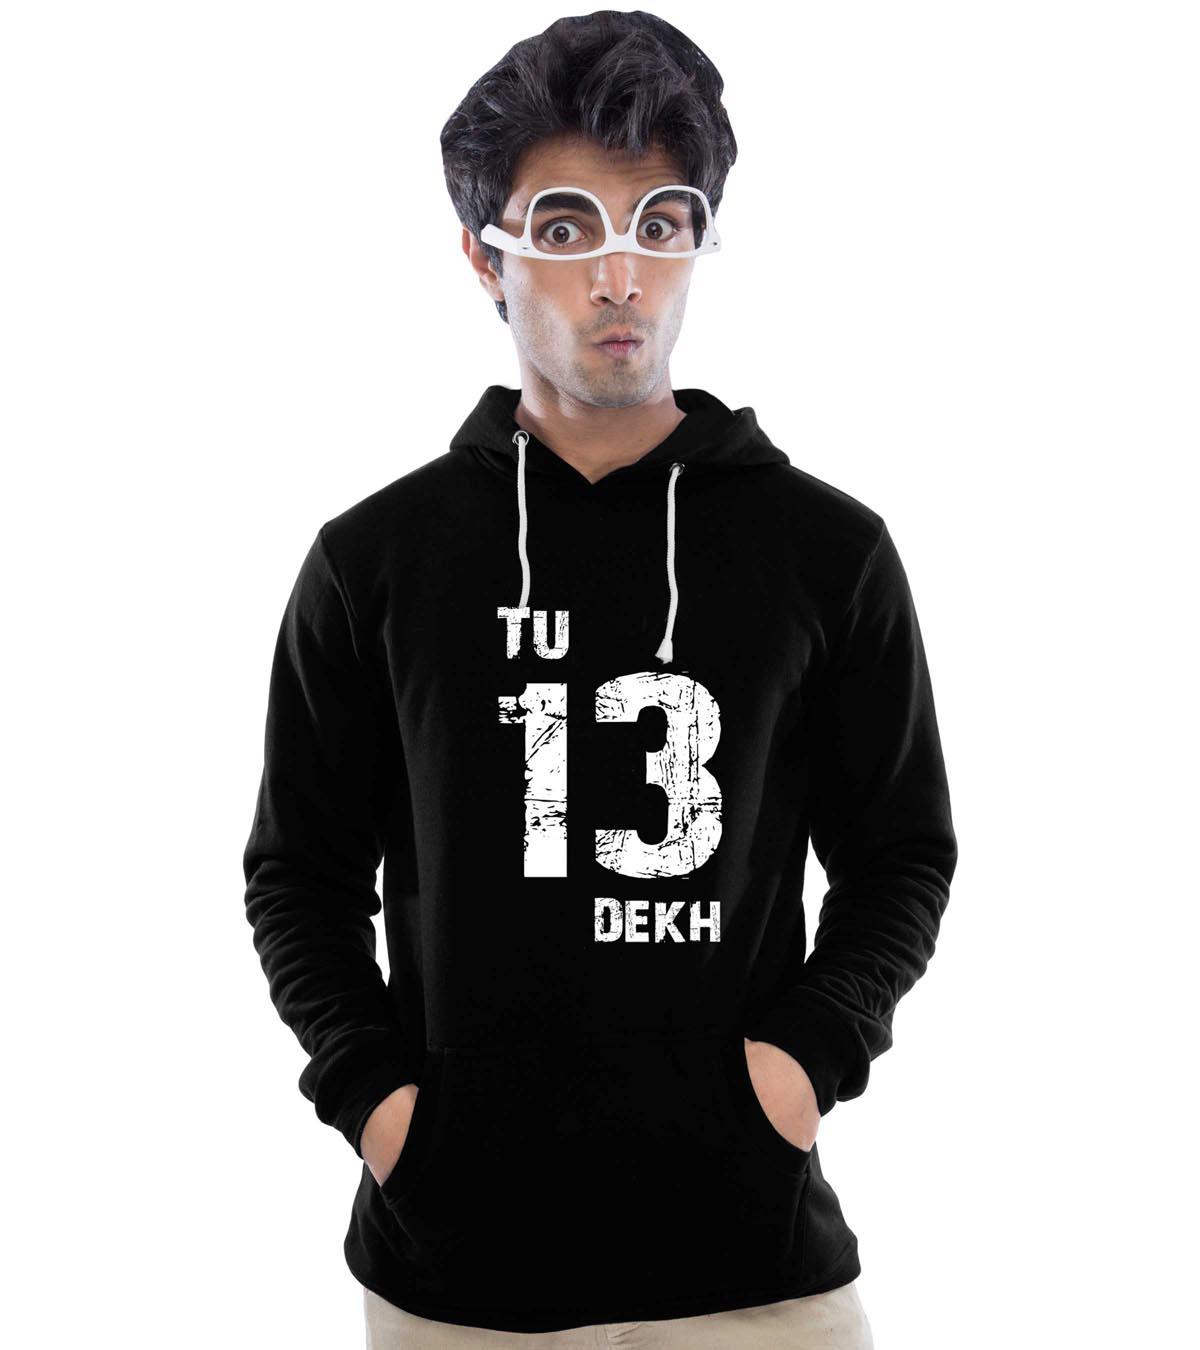 Tu 13 Dekh Hoodies